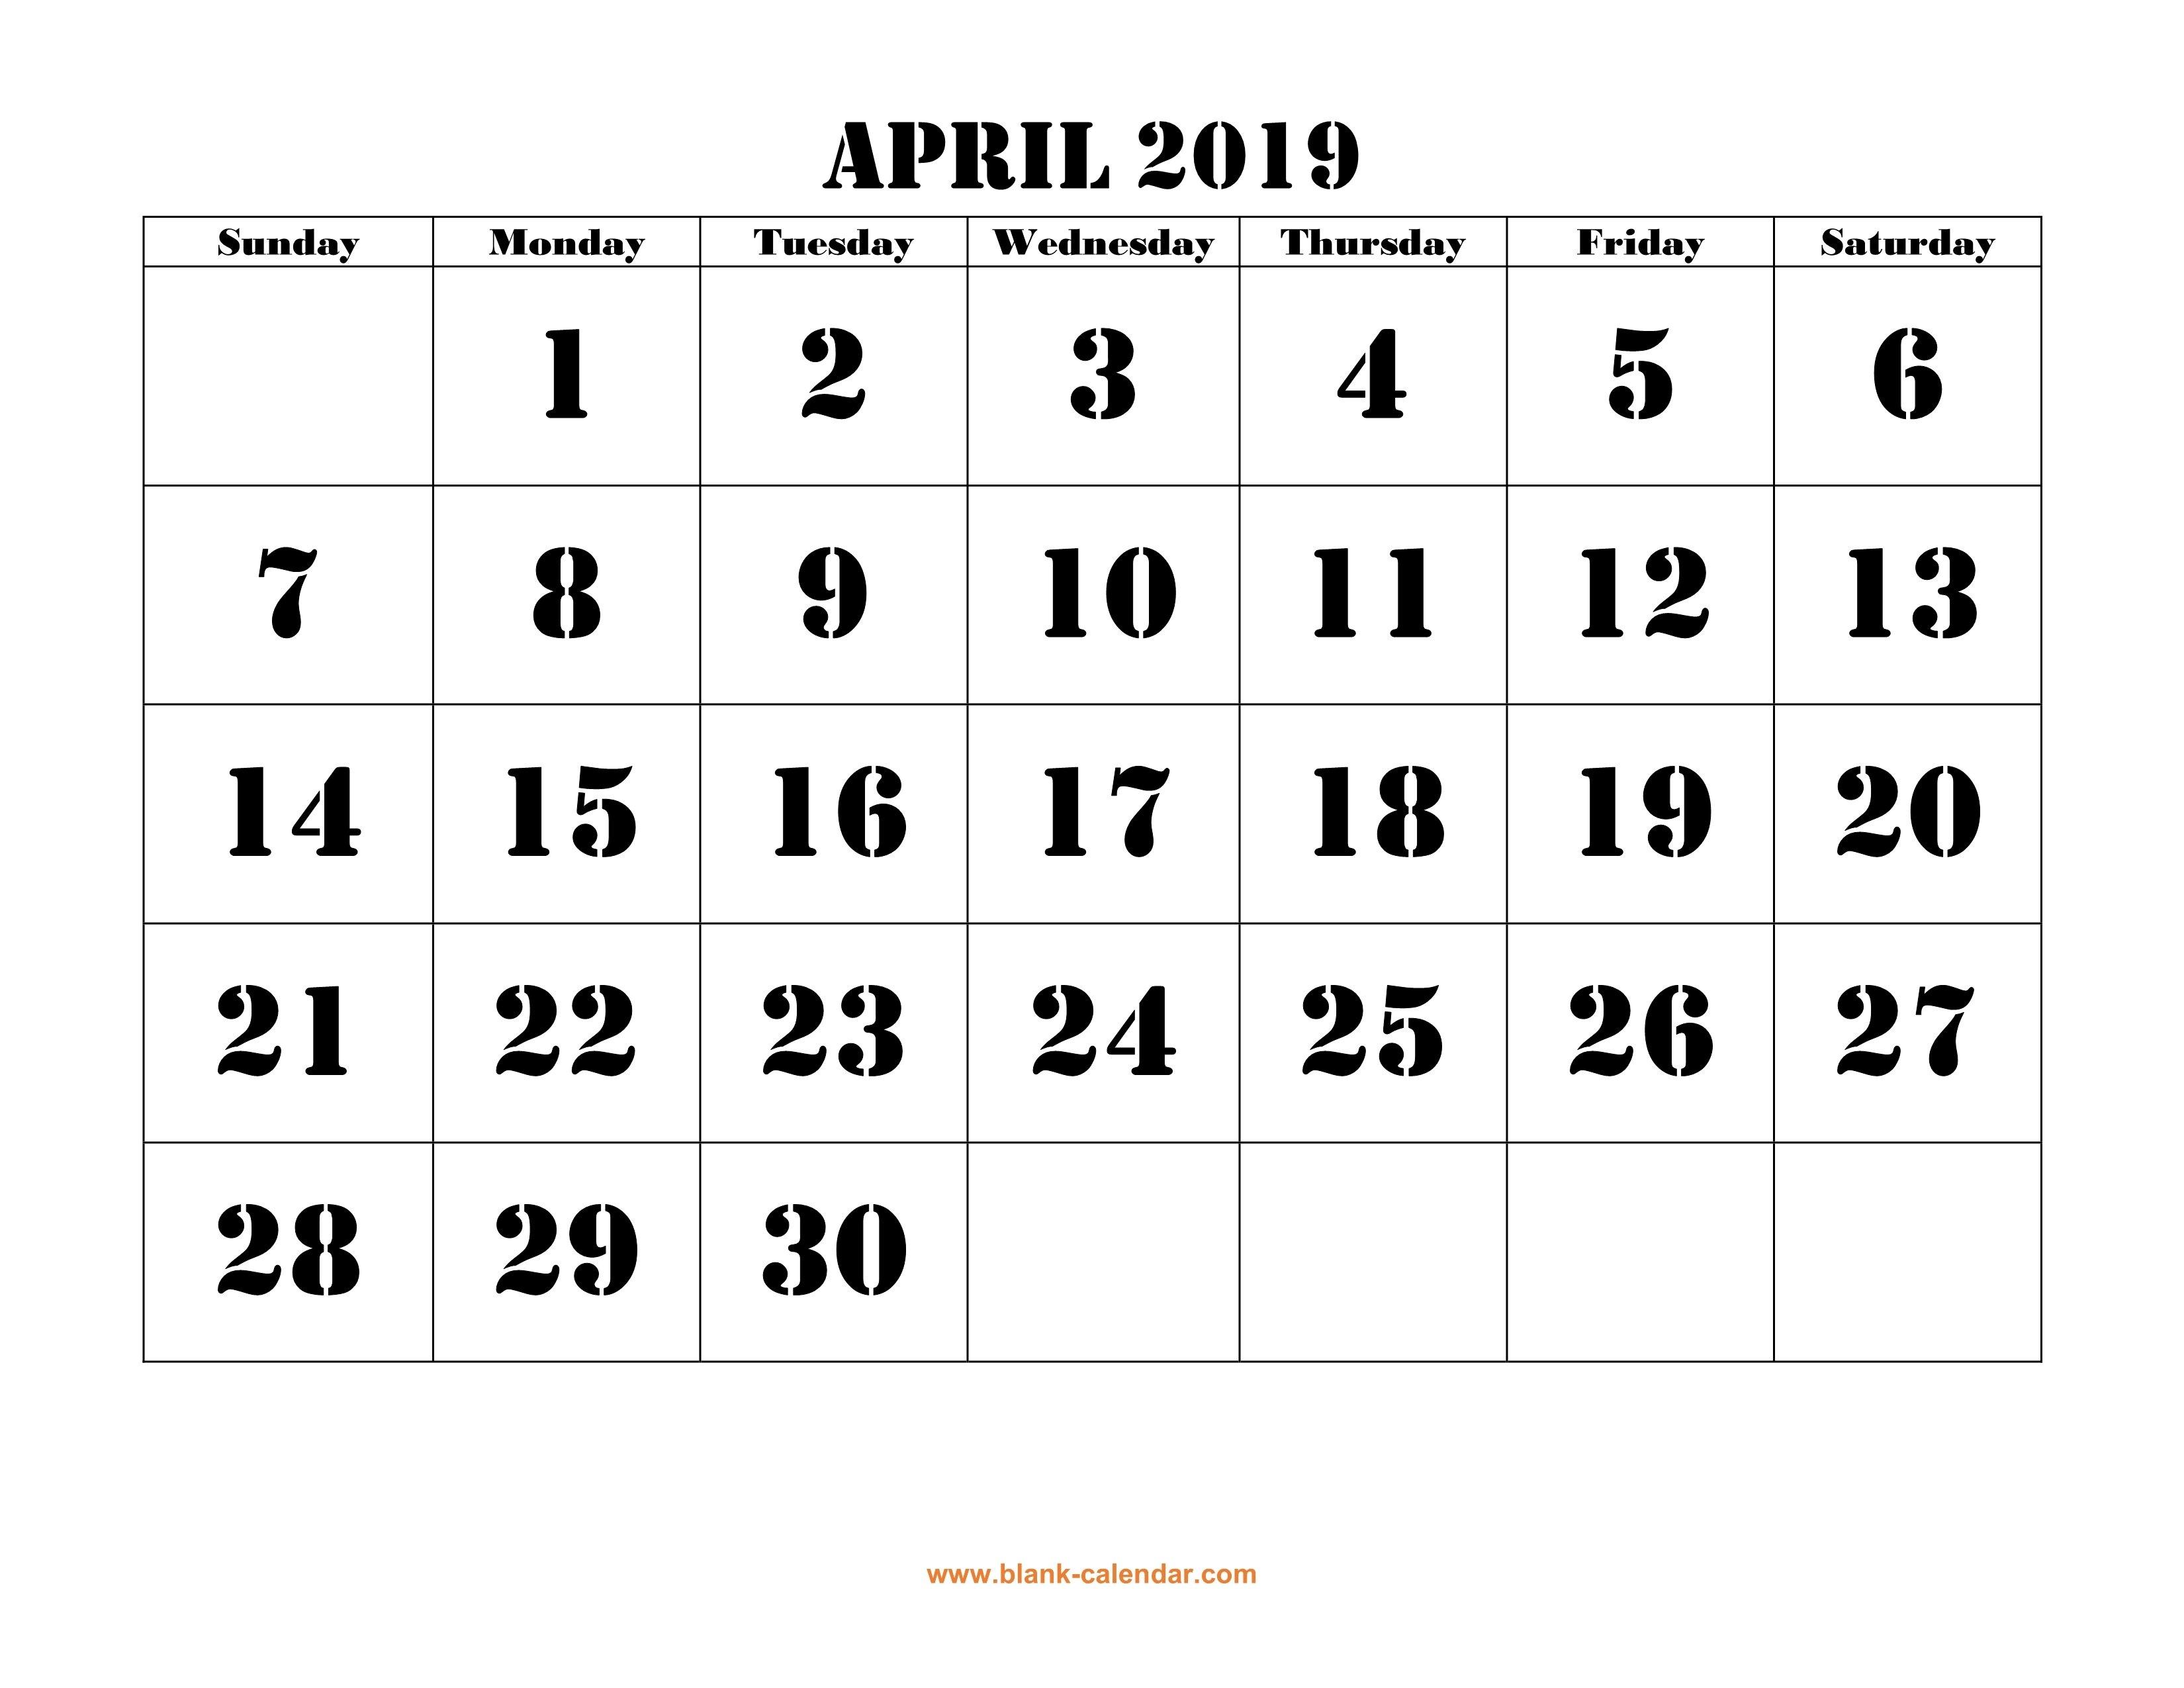 Free Download Printable April 2019 Calendar, Large Font Design April 9 2019 Calendar